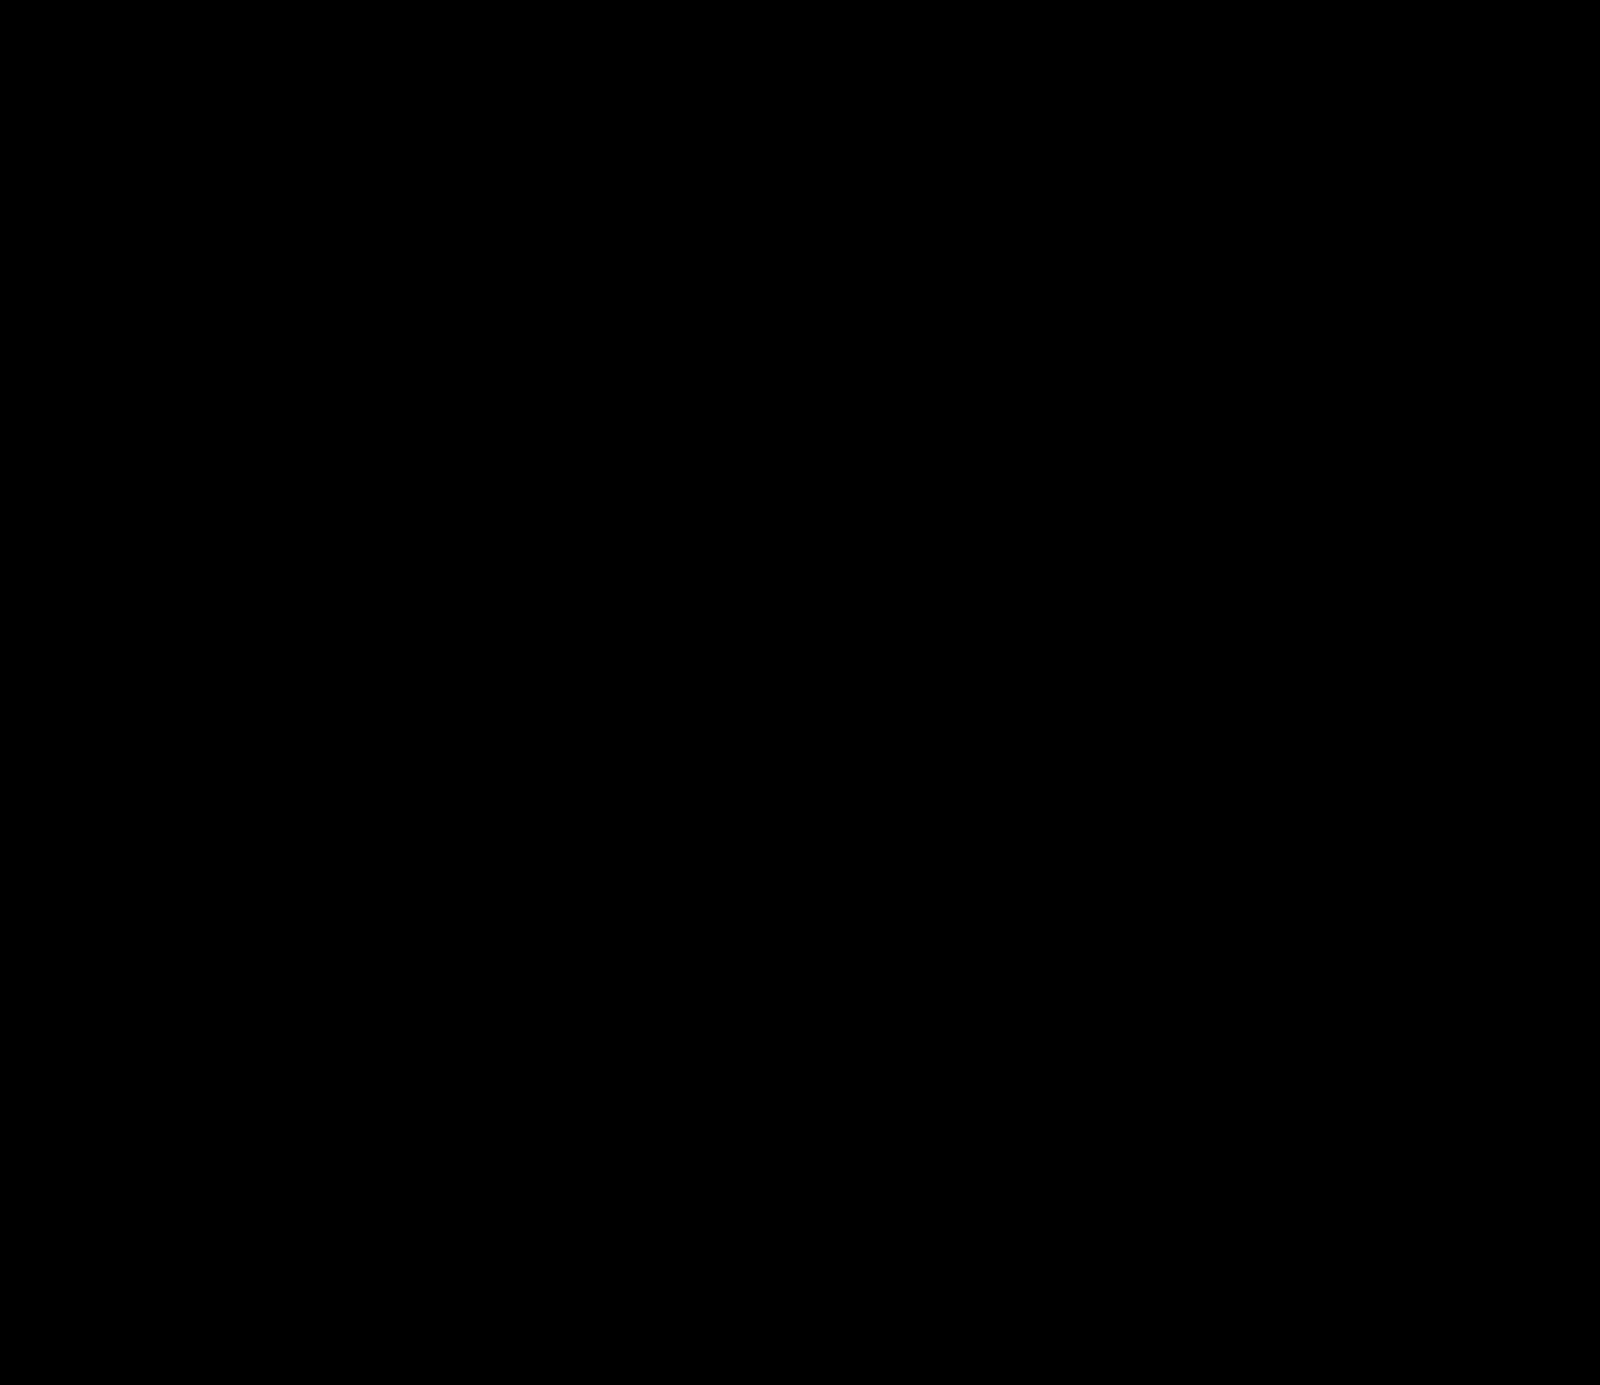 triangulo-equilatero-2